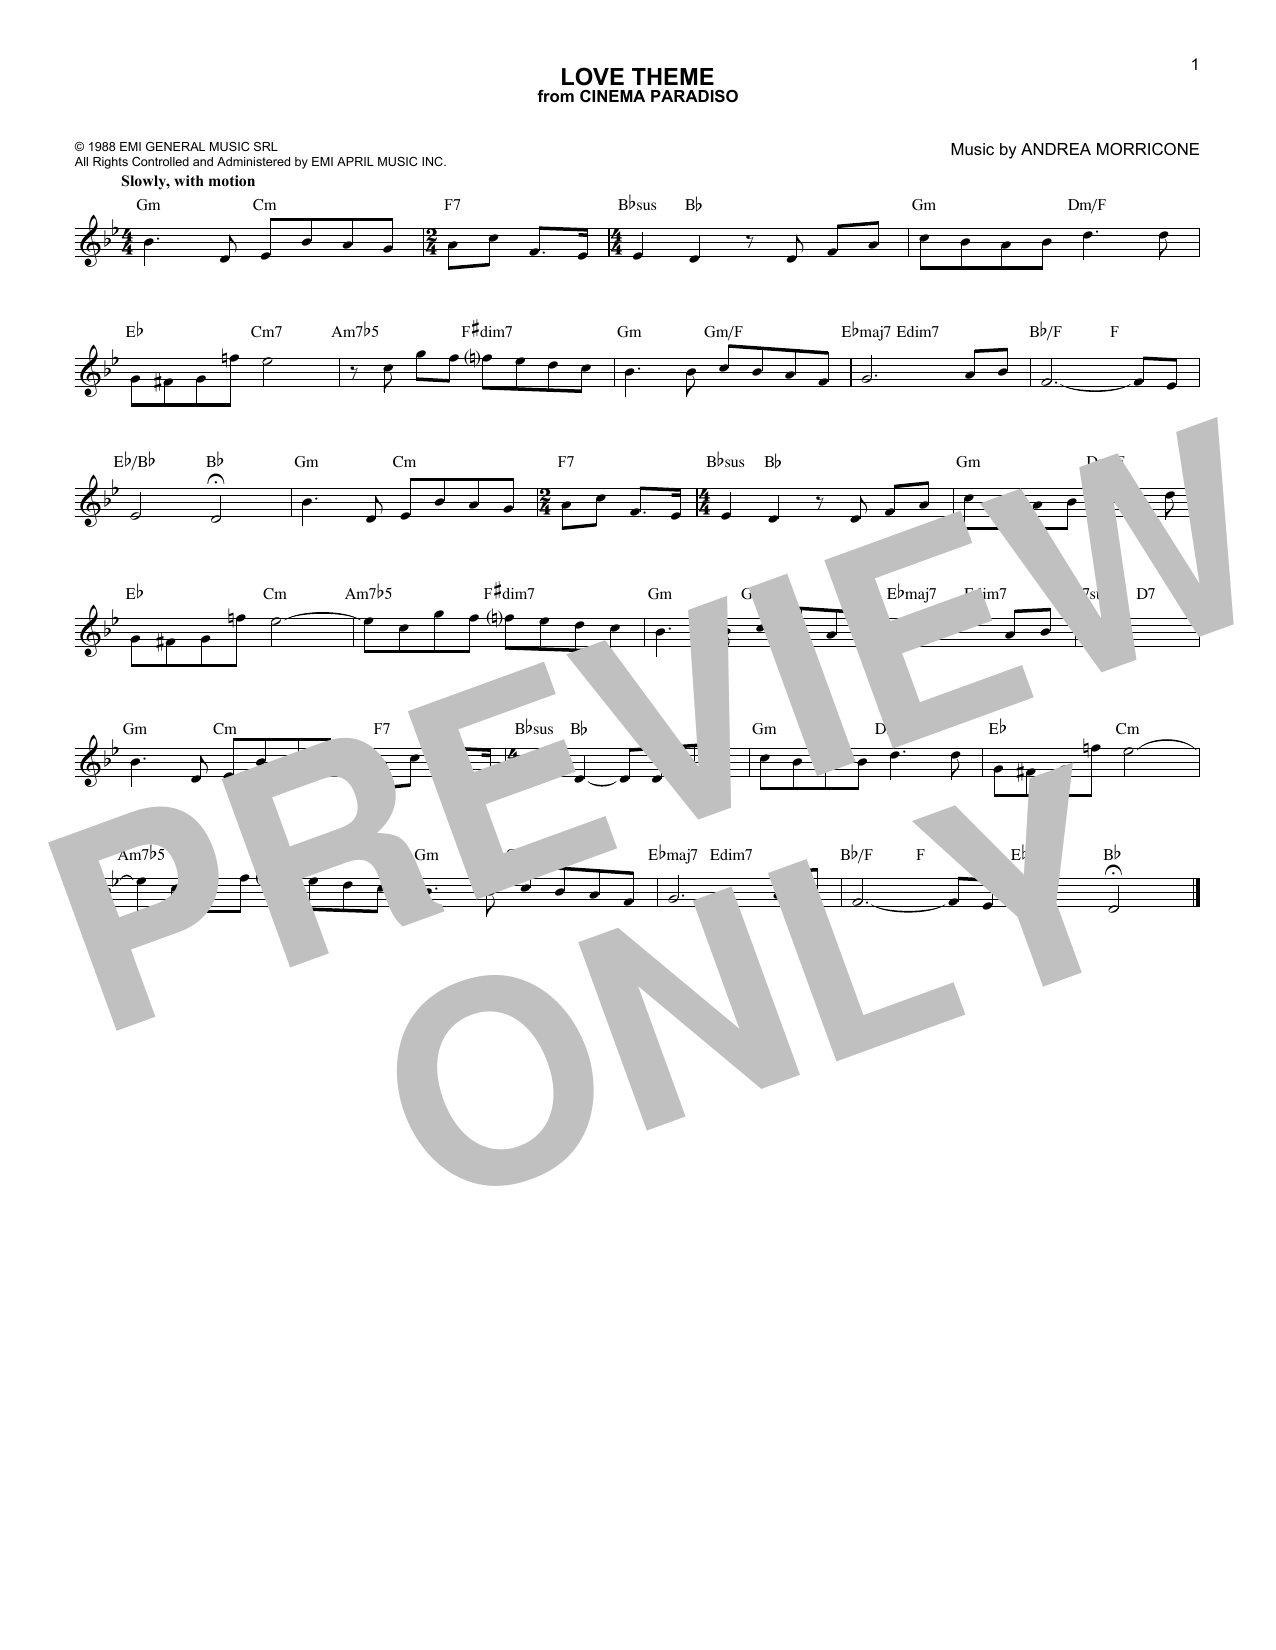 Andrea Morricone - Love Theme (Tema D'Amore)